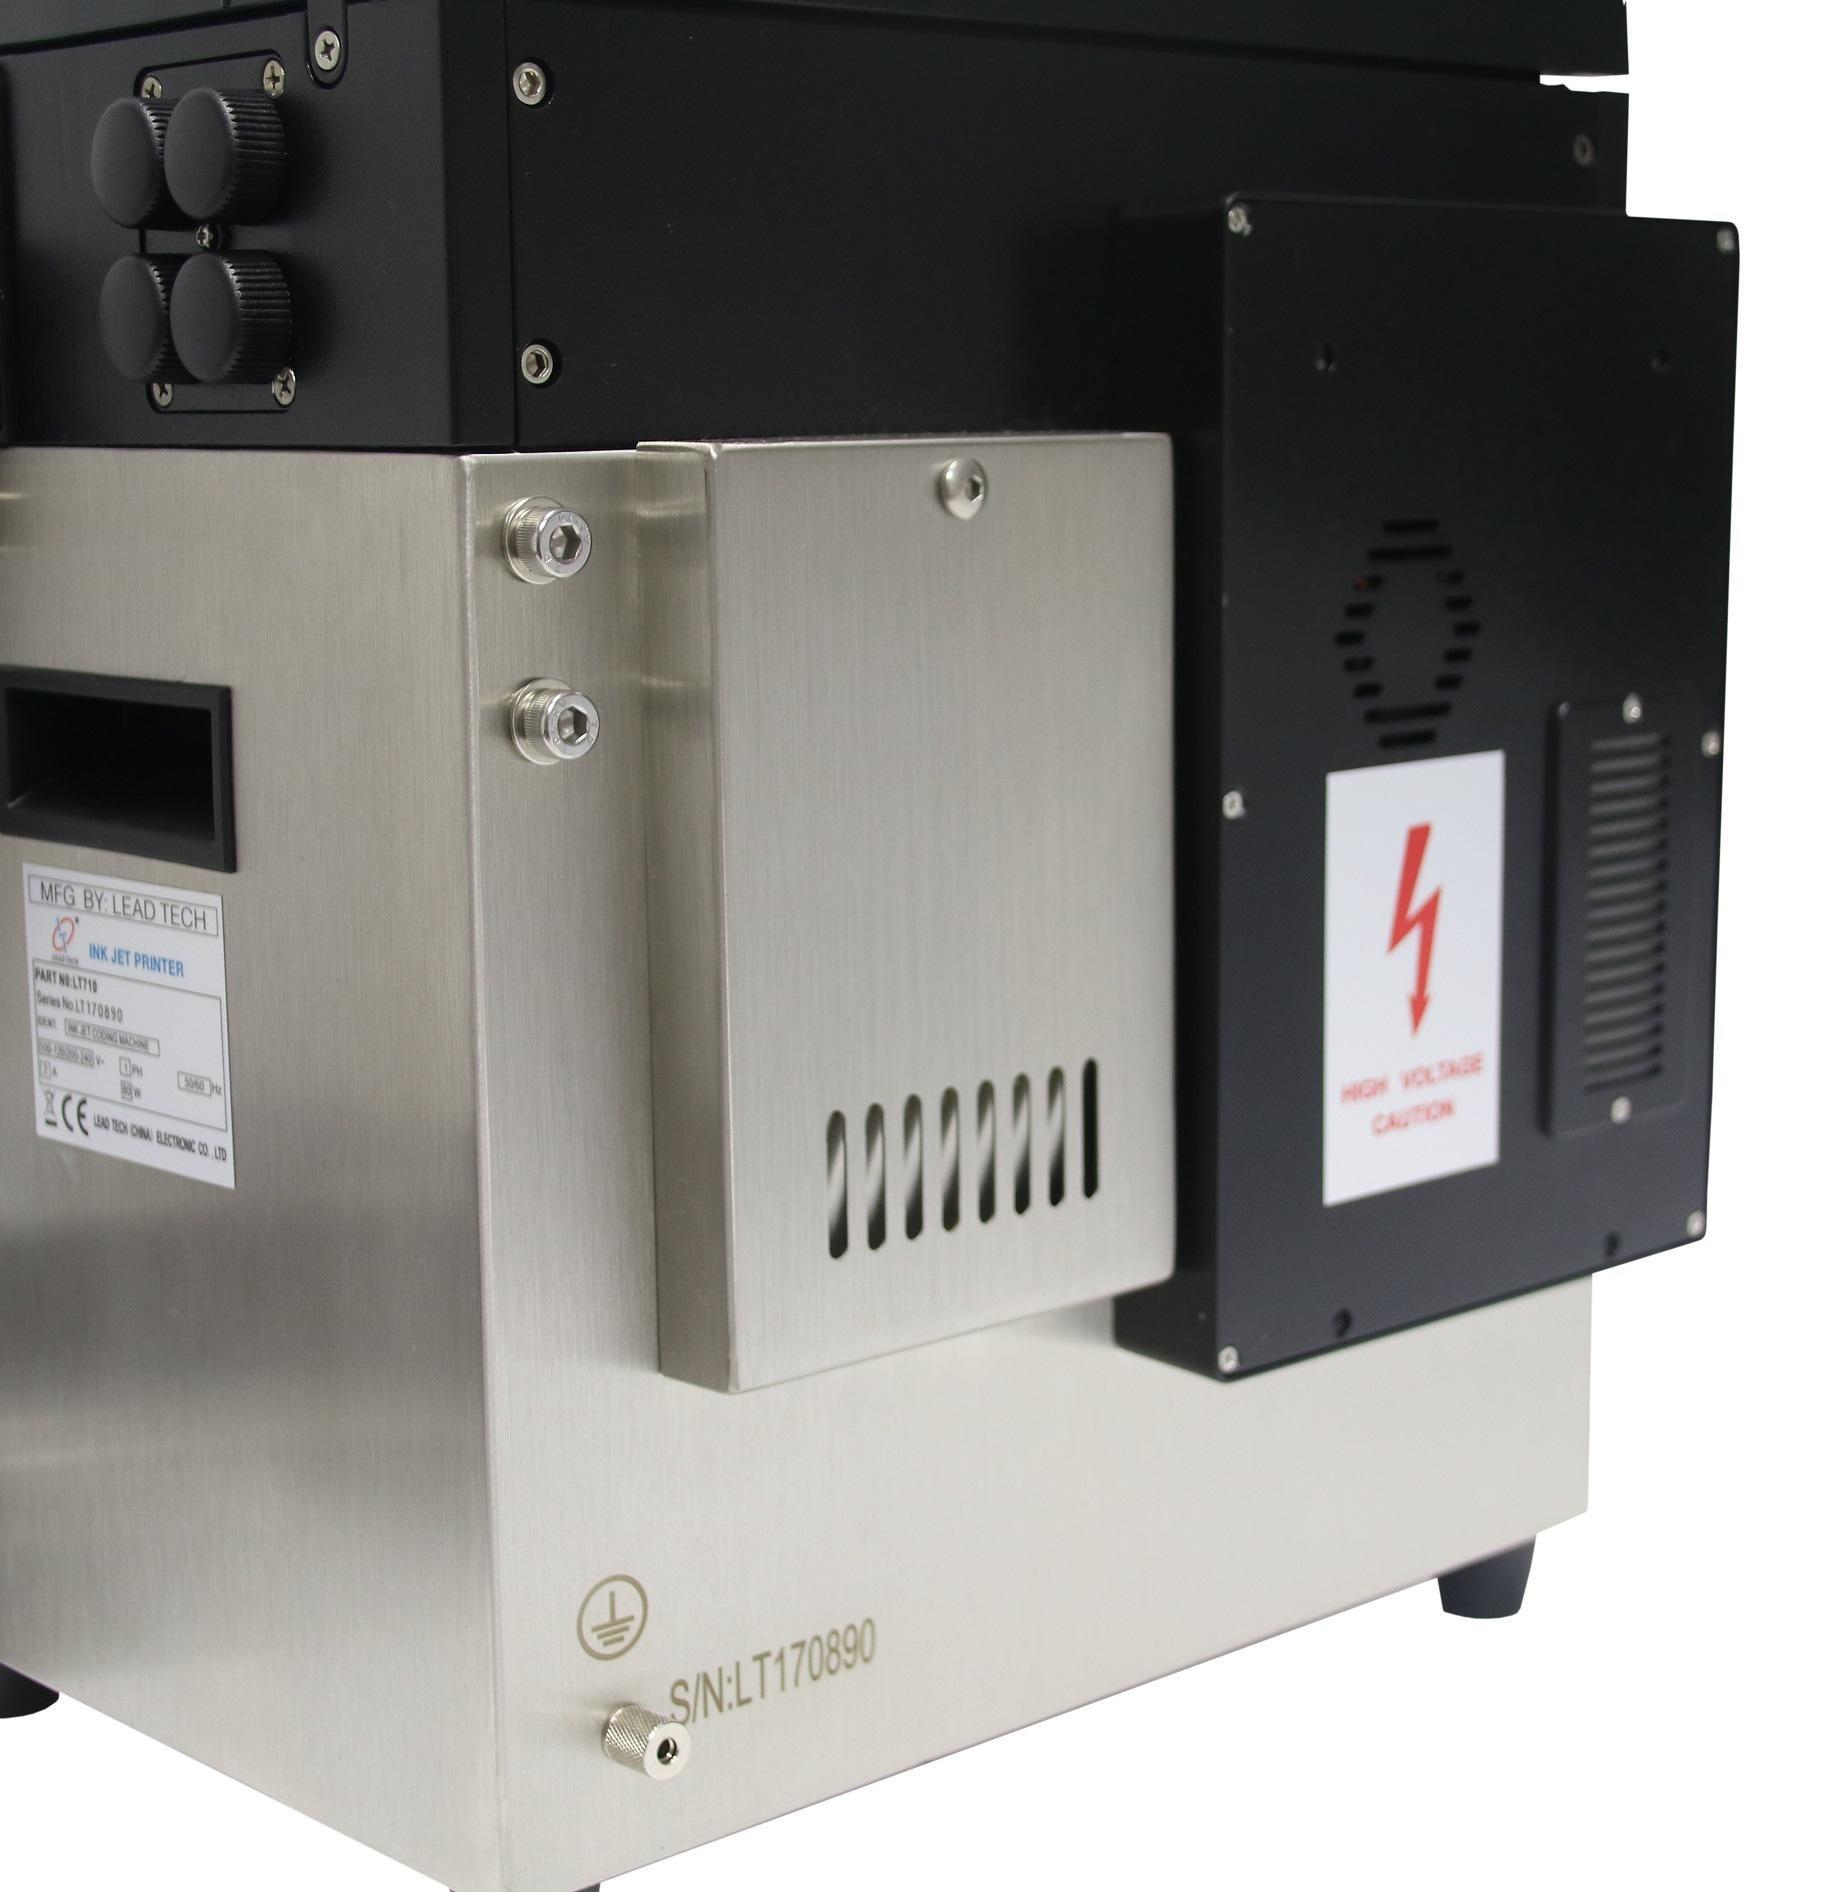 Lead Tech Egg Coding Continuous Cij Inkjet Printer Lt760